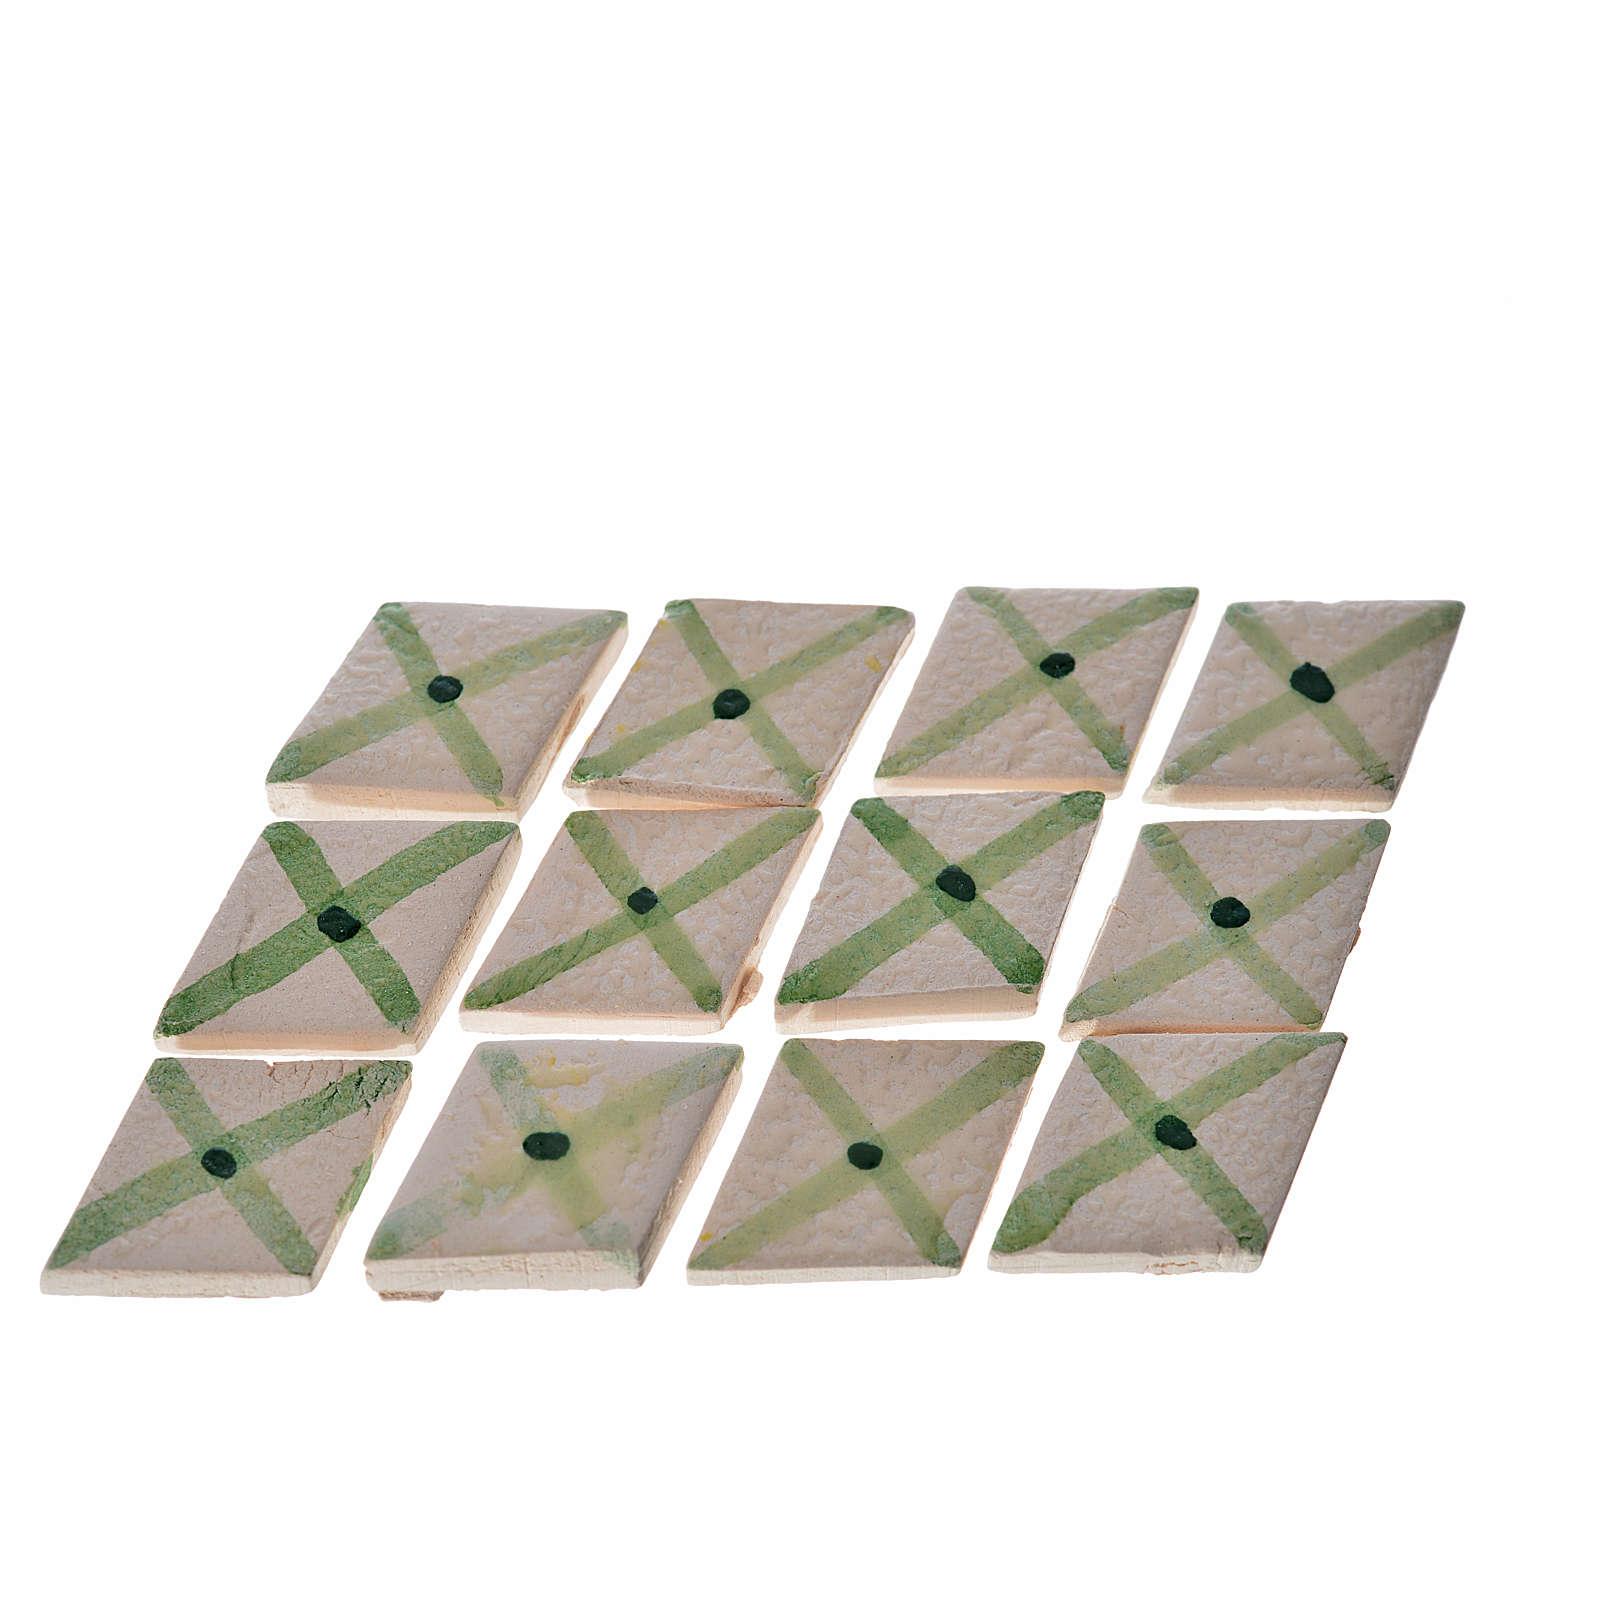 Mattonelle terracotta smaltate 60 pz romboidali riga verde per p 4